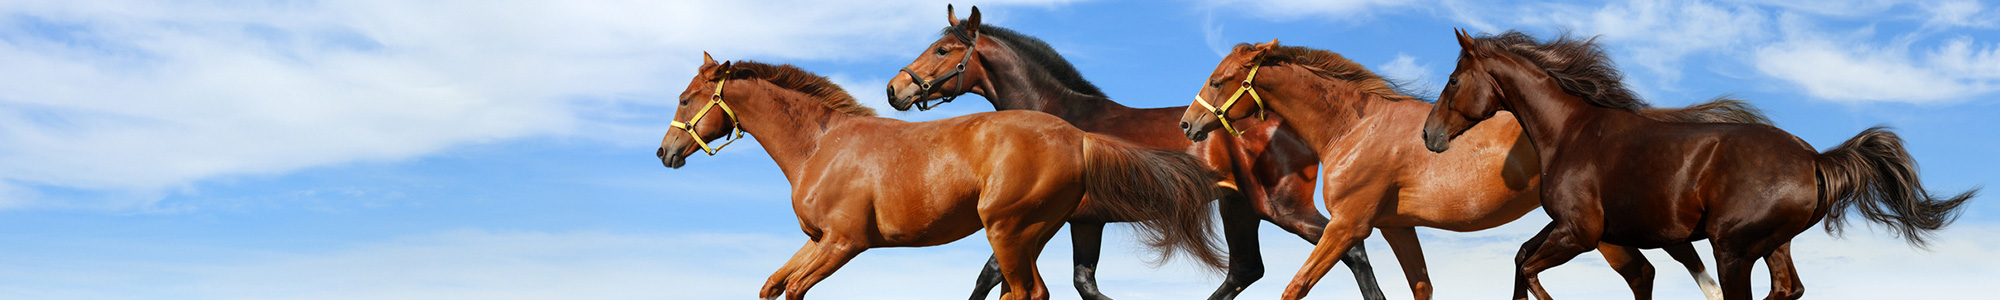 Stajenne - Art-horse Sklep jeździecki